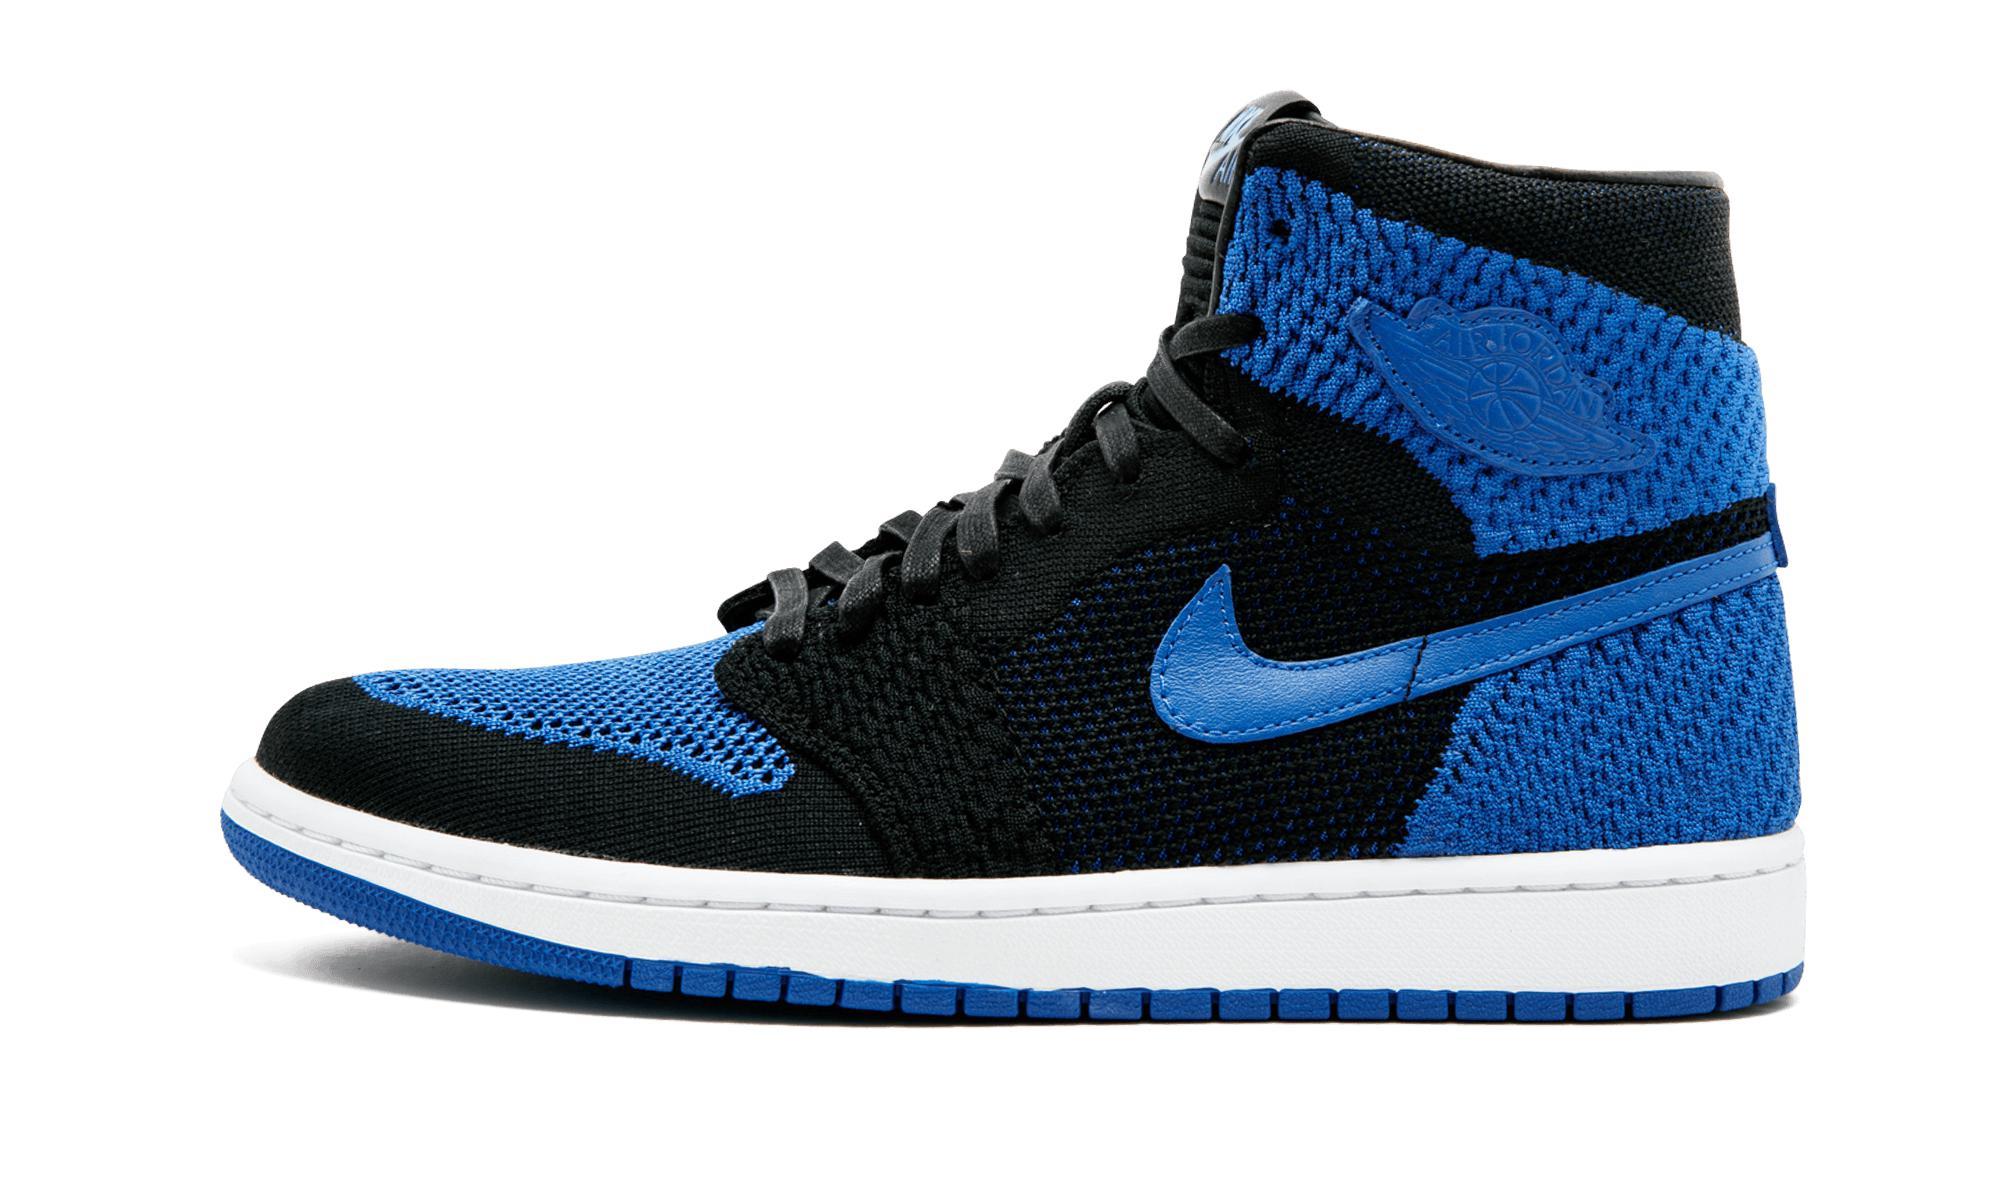 detailed look 763df 6667a Lyst - Nike Air Jordan 1 Retro Hi Flyknit Basketball Shoes in Blue ...